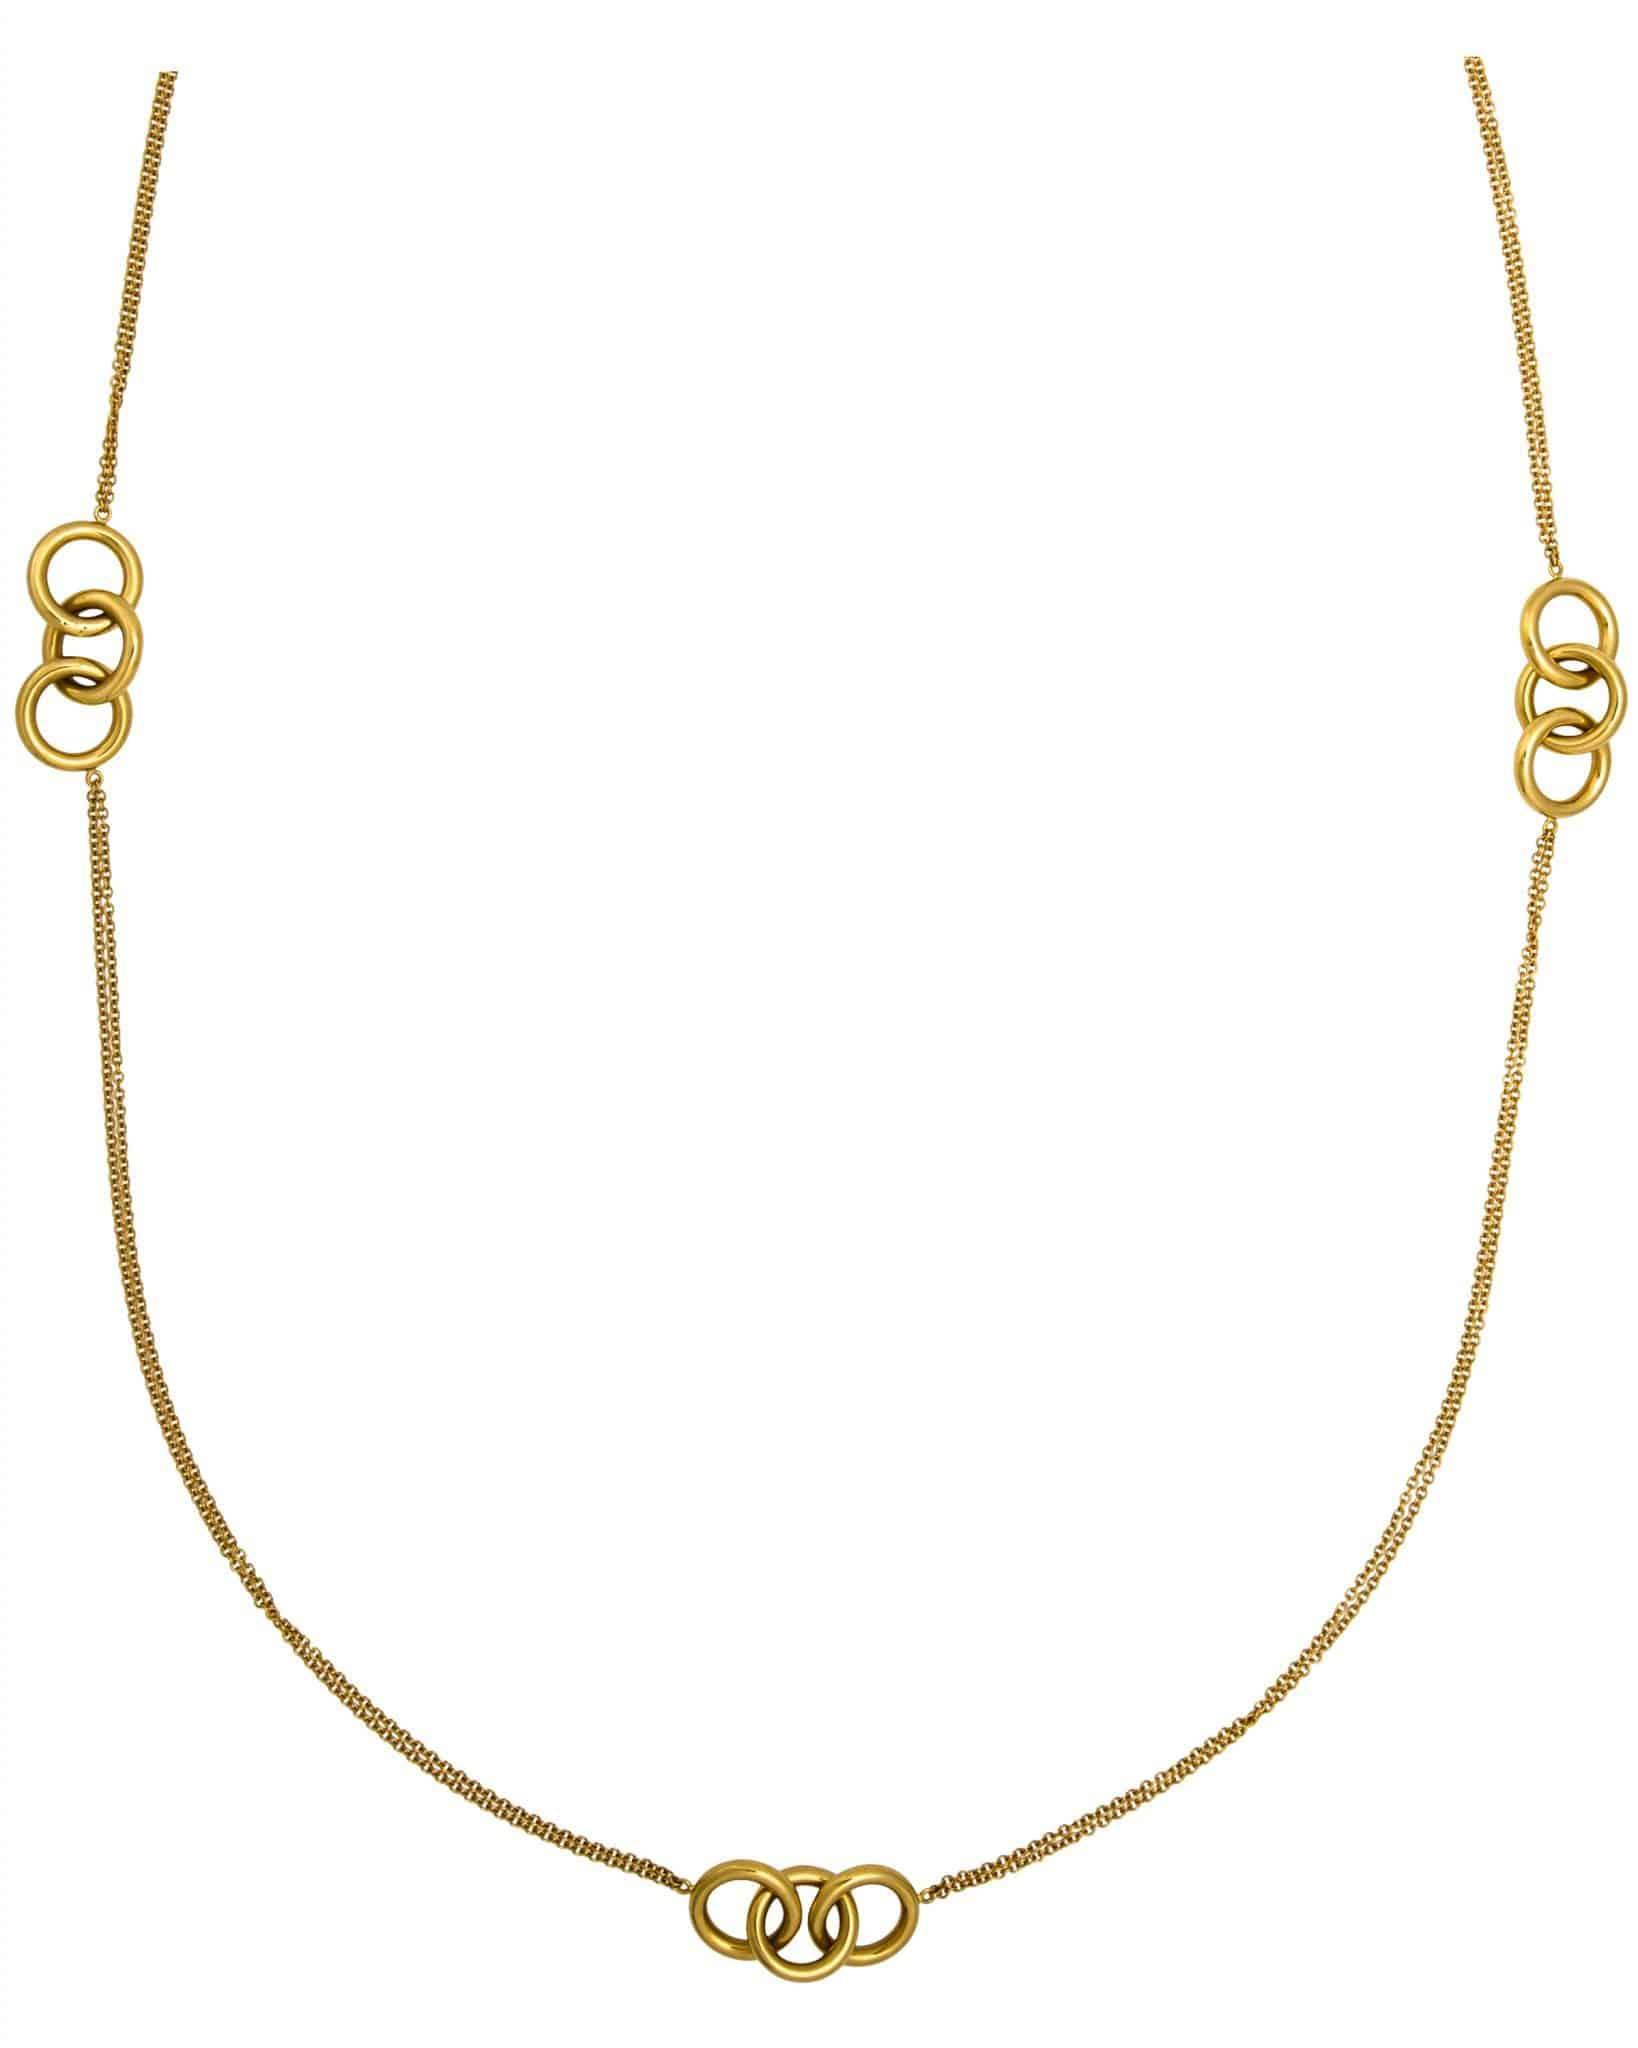 Roberto Coin 18K Yellow Gold 3 Circle Amethyst Necklace